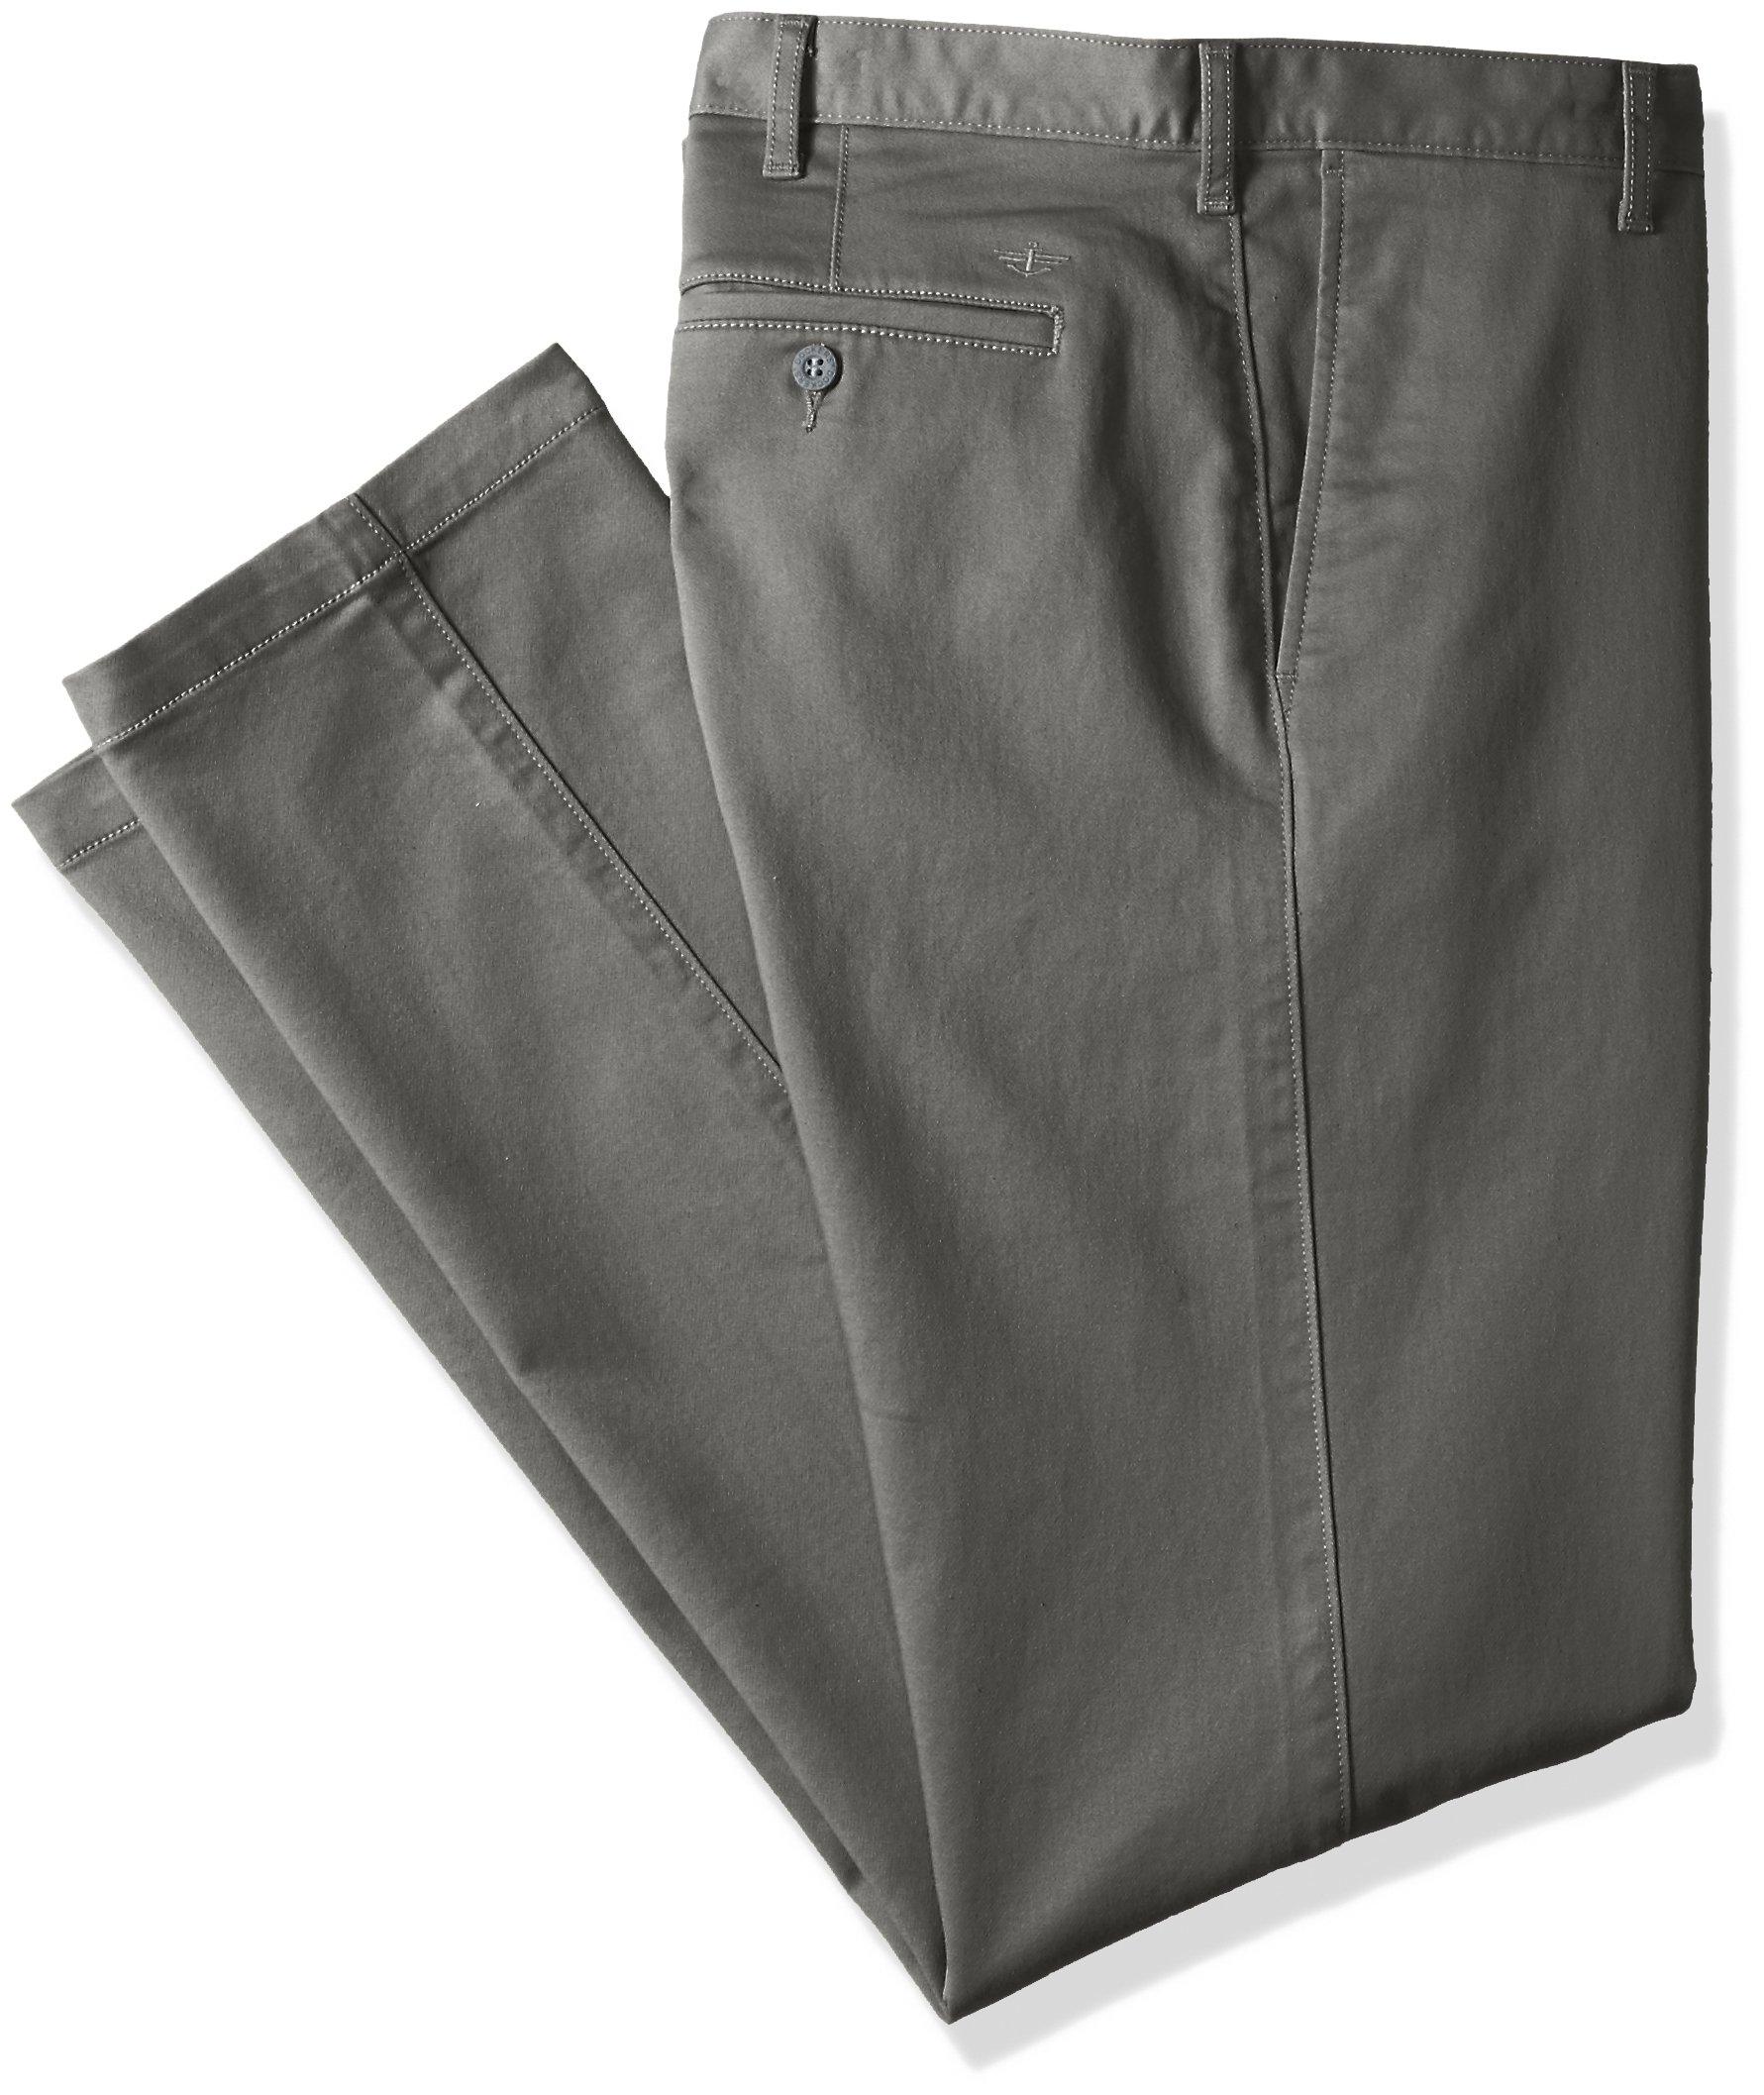 dda2575dc8 Amazon.com: Big & Tall: Clothing, Shoes & Jewelry: Shirts, Active ...